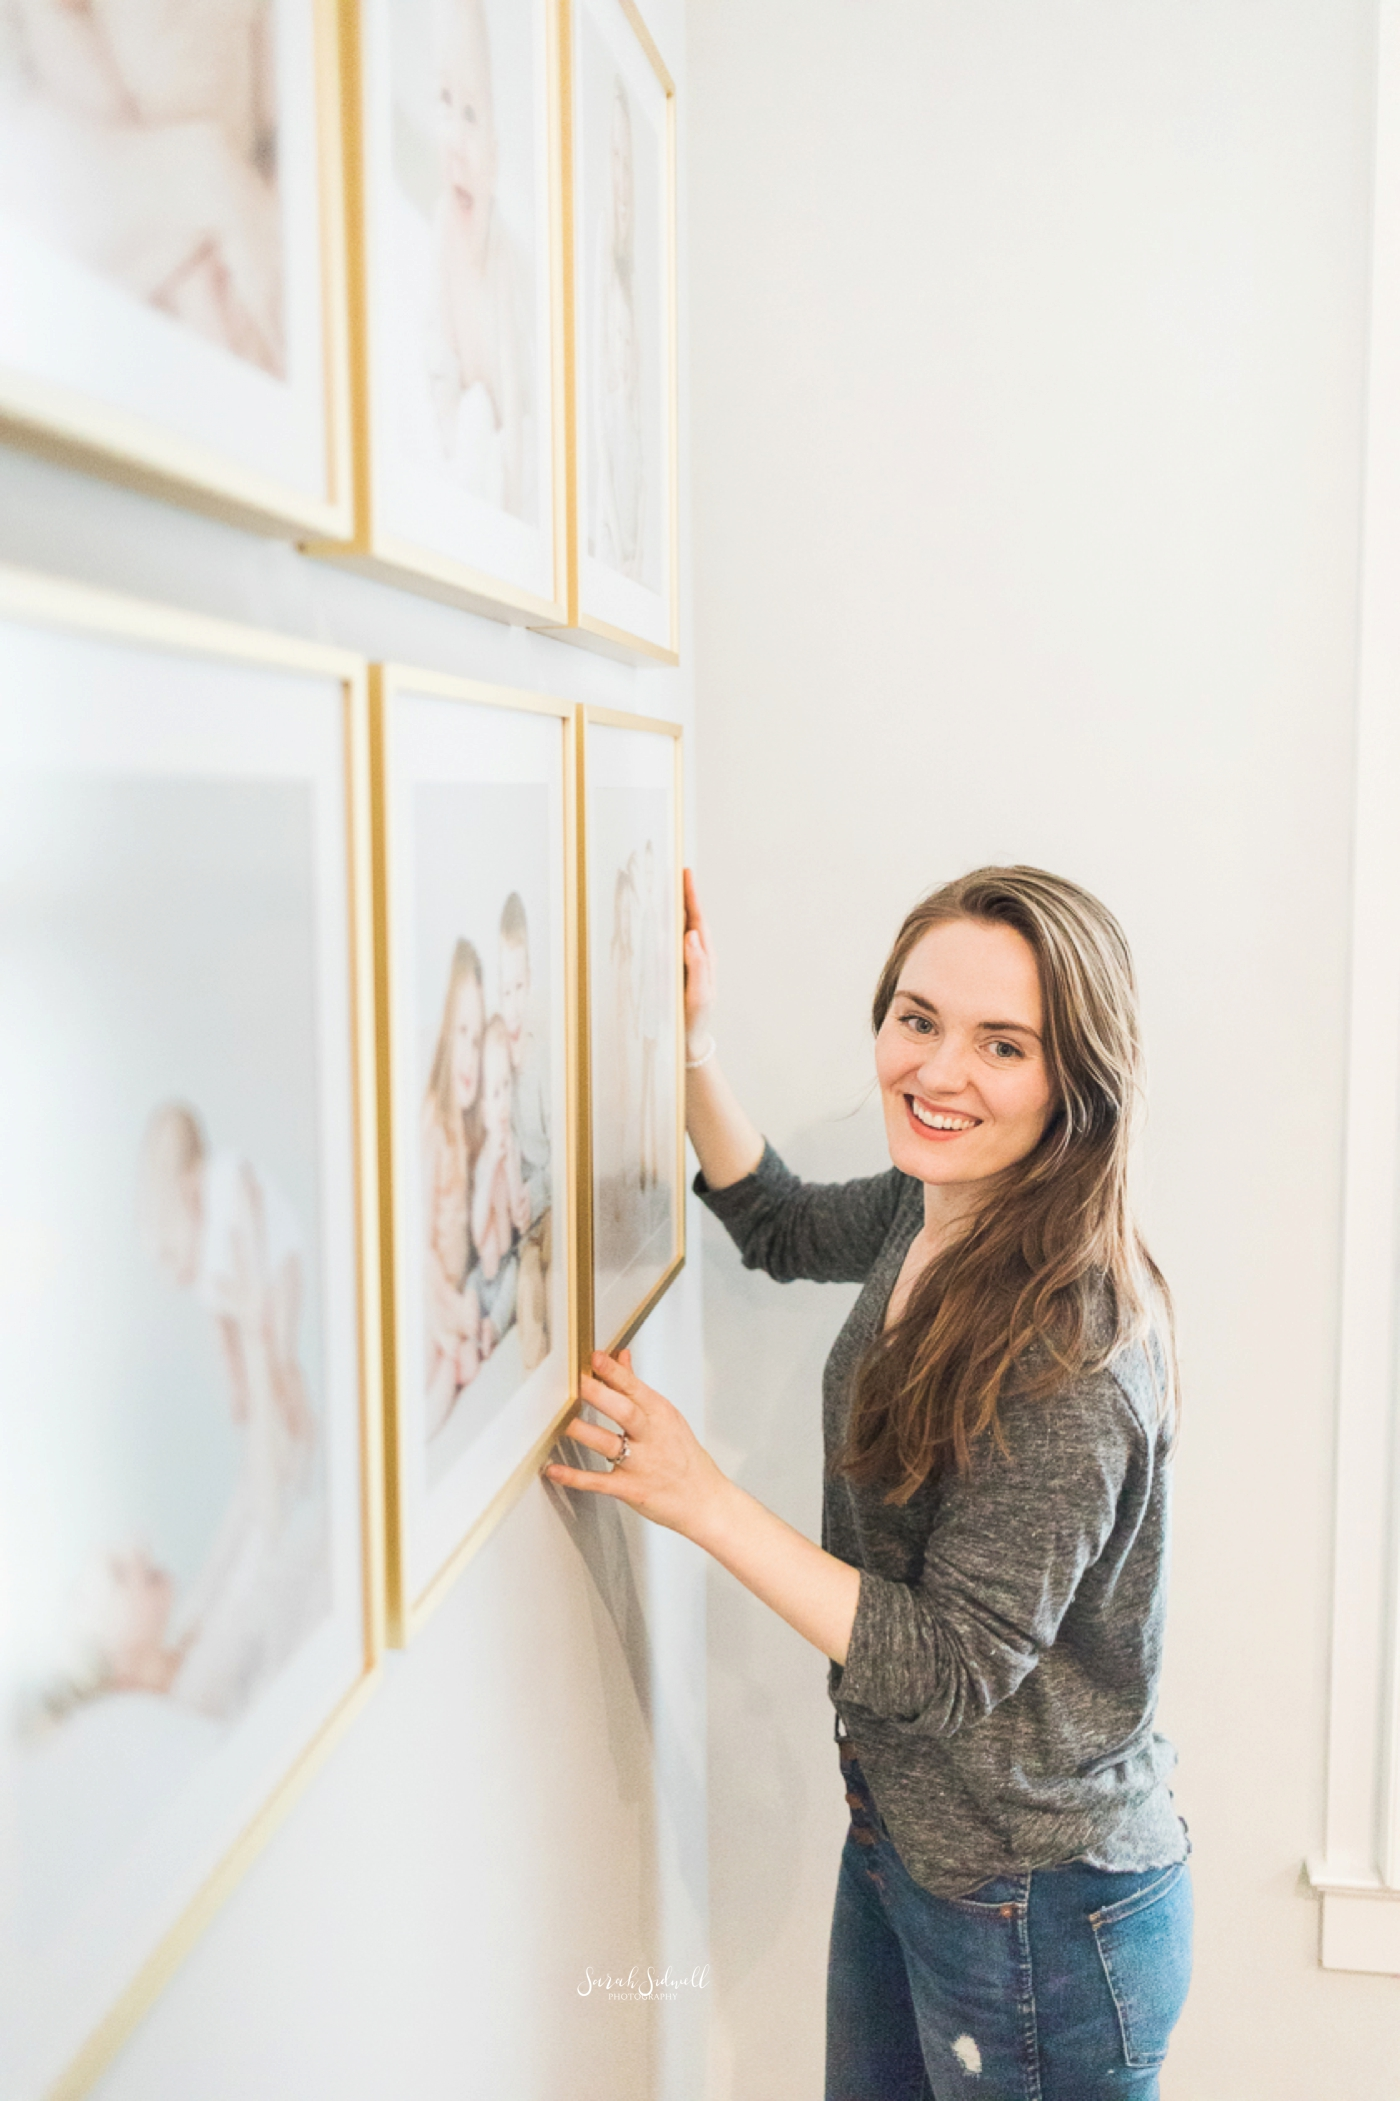 Family Photo Gallery Wall | Use photos as stylish home decor